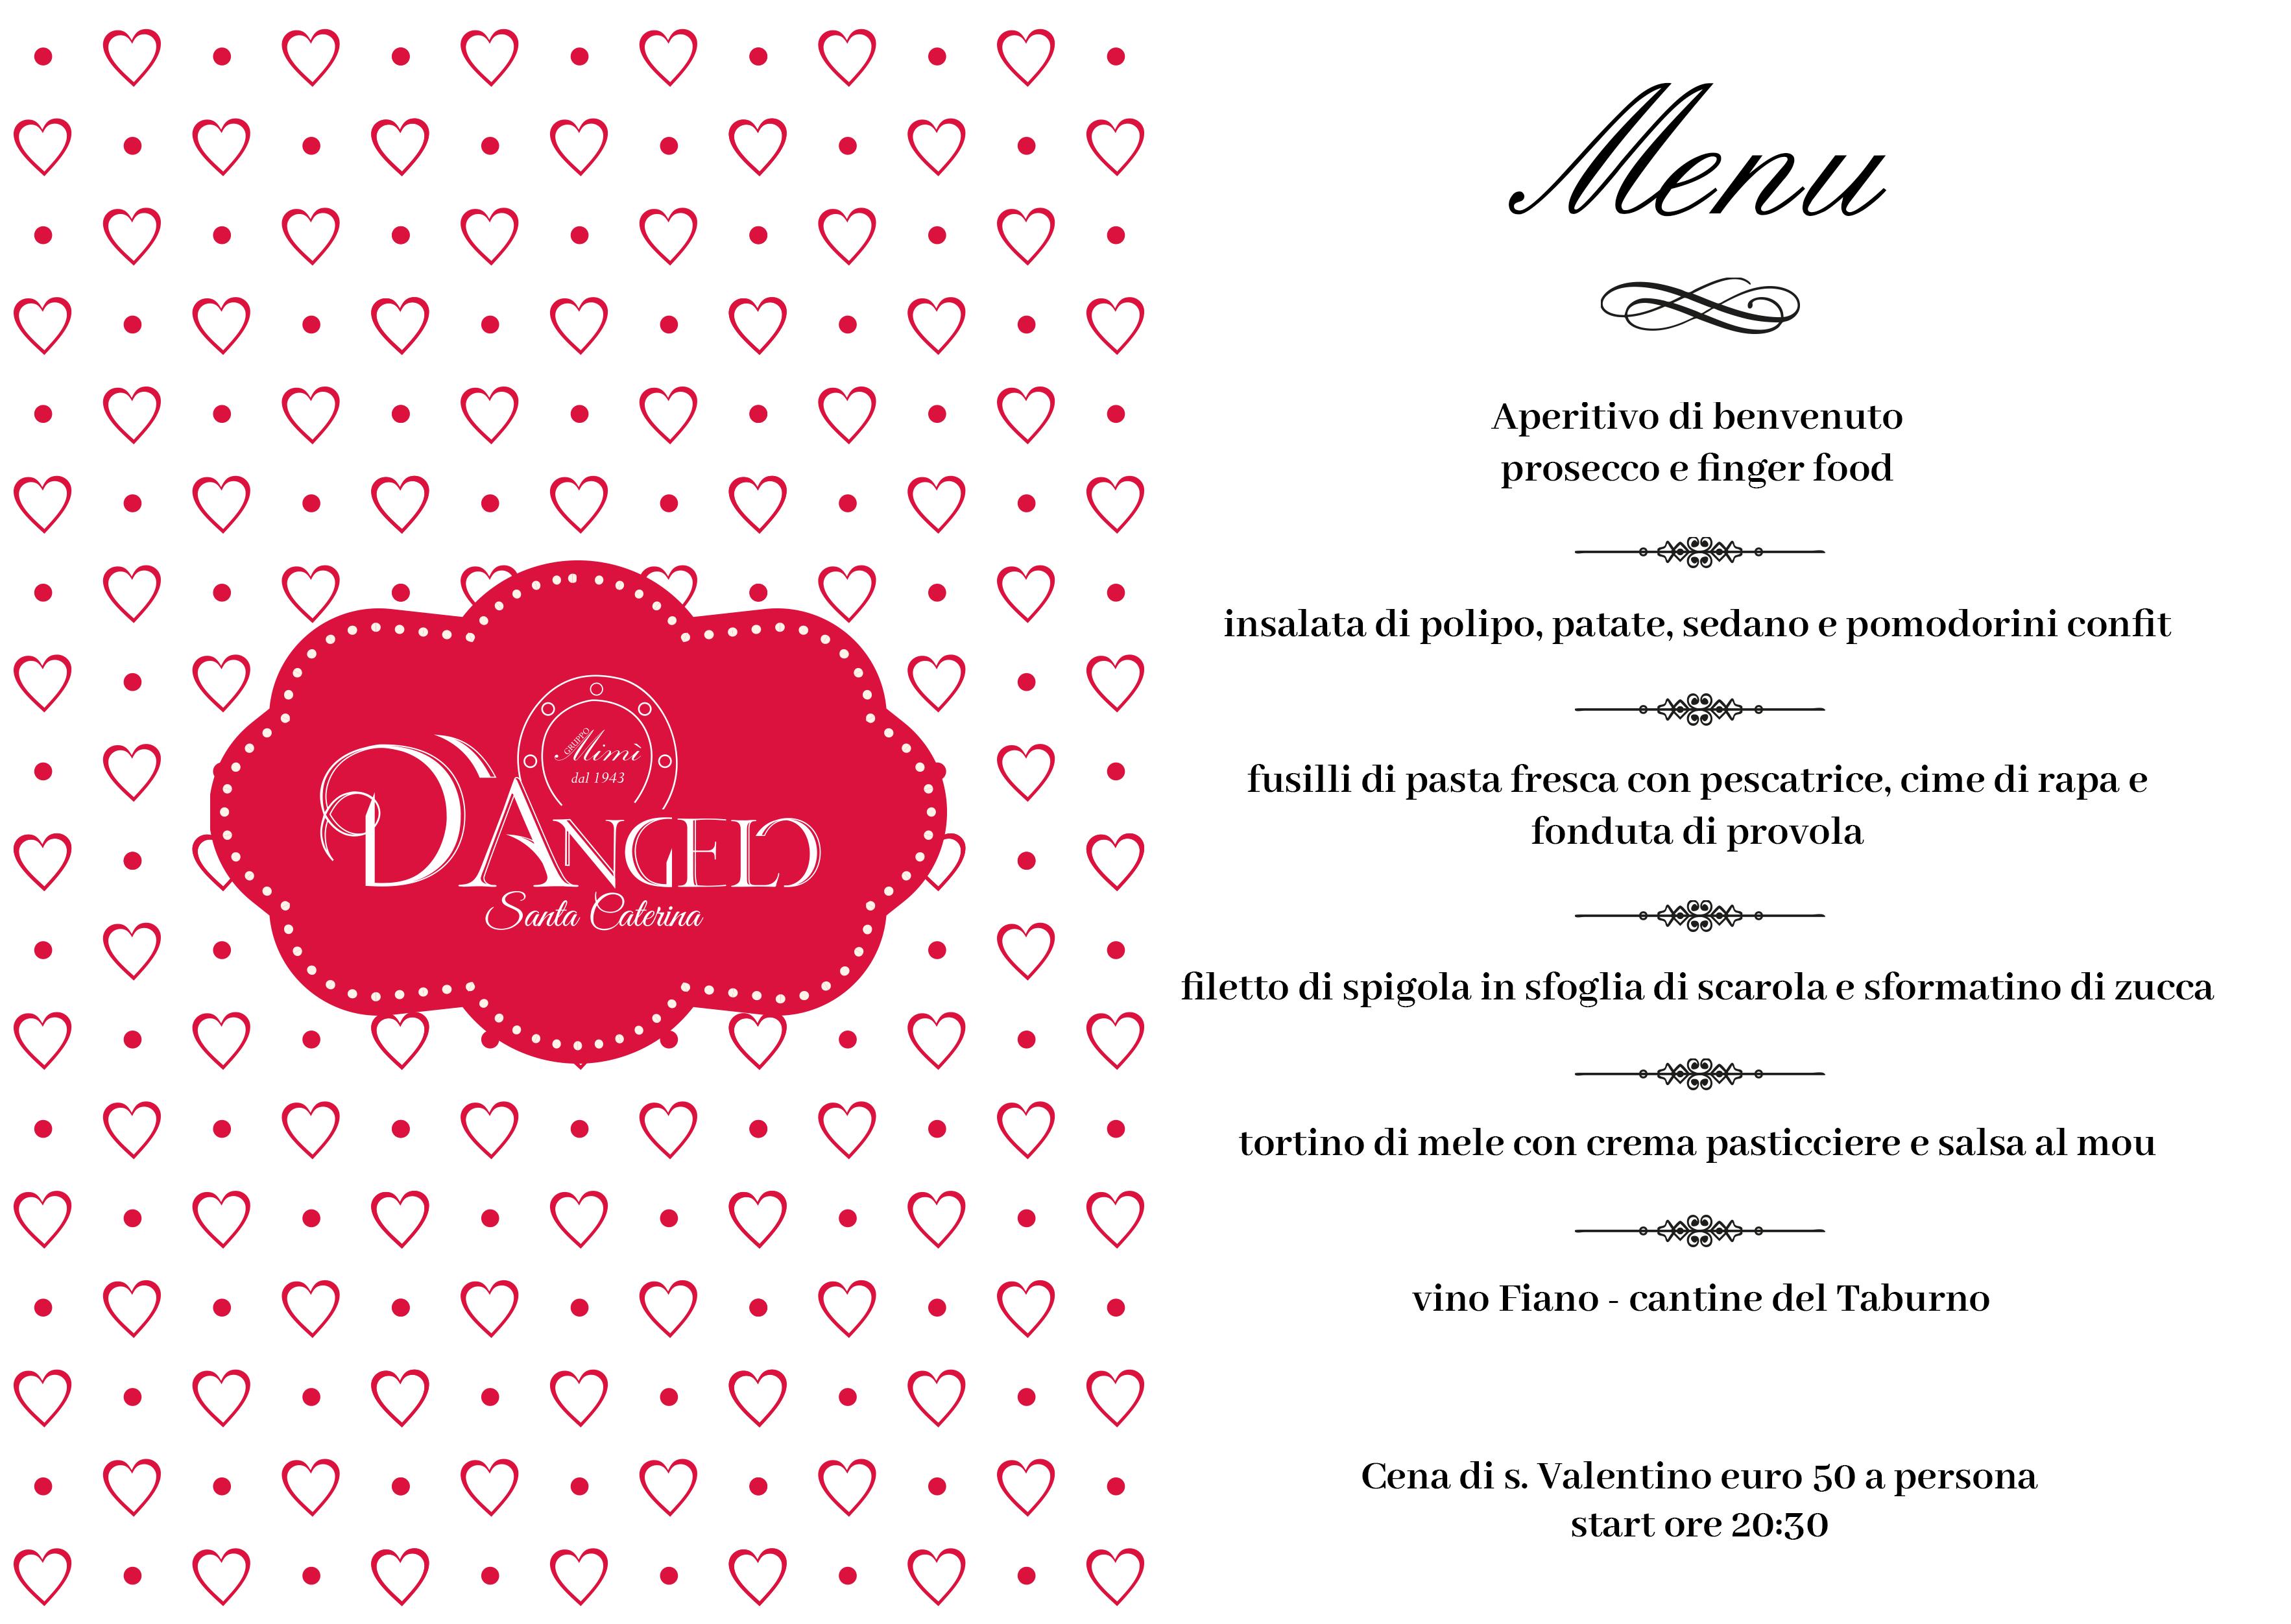 San Valentino 2019 Da D Angelo Santa Caterina D Angelo